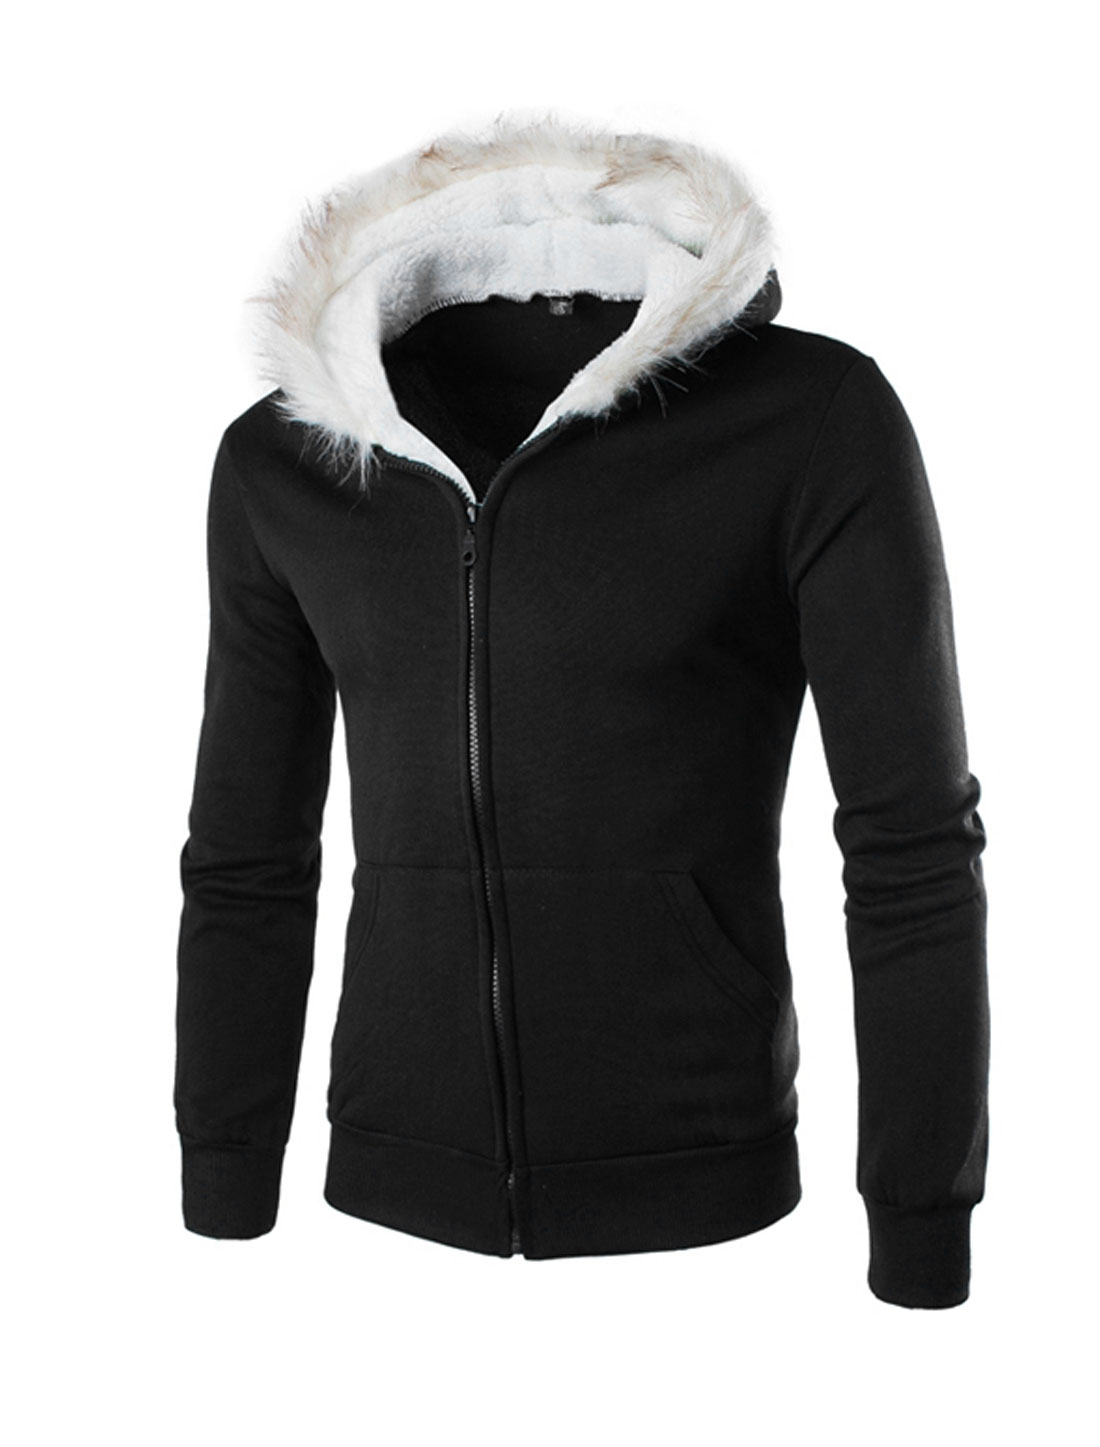 Men Long Sleeves Soft Lined Zip Up Hooded Jacket Black M